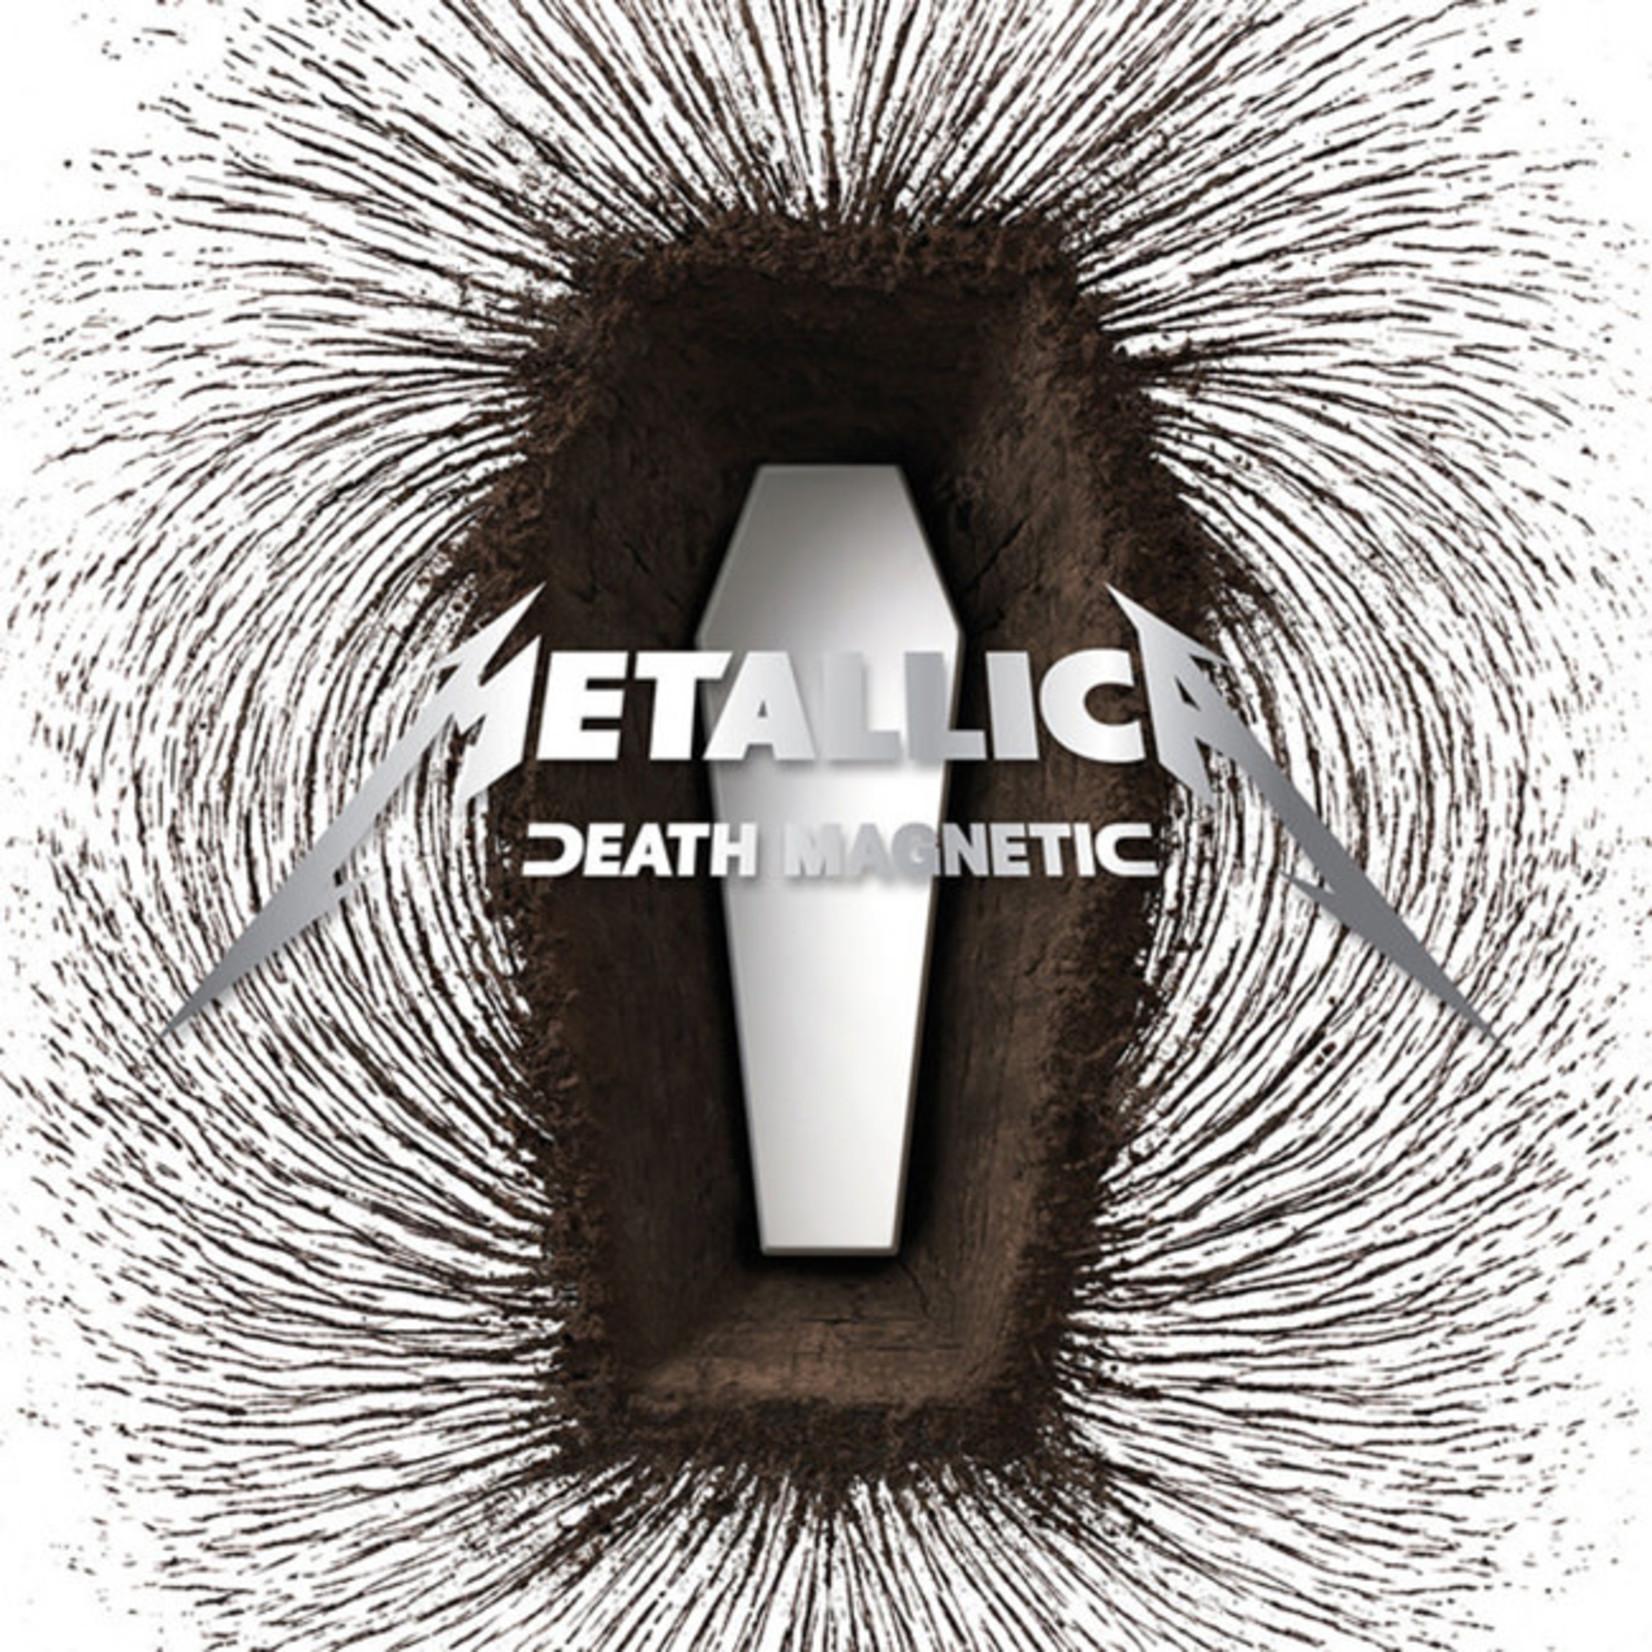 [New] Metallica: Death Magnetic (2LP)